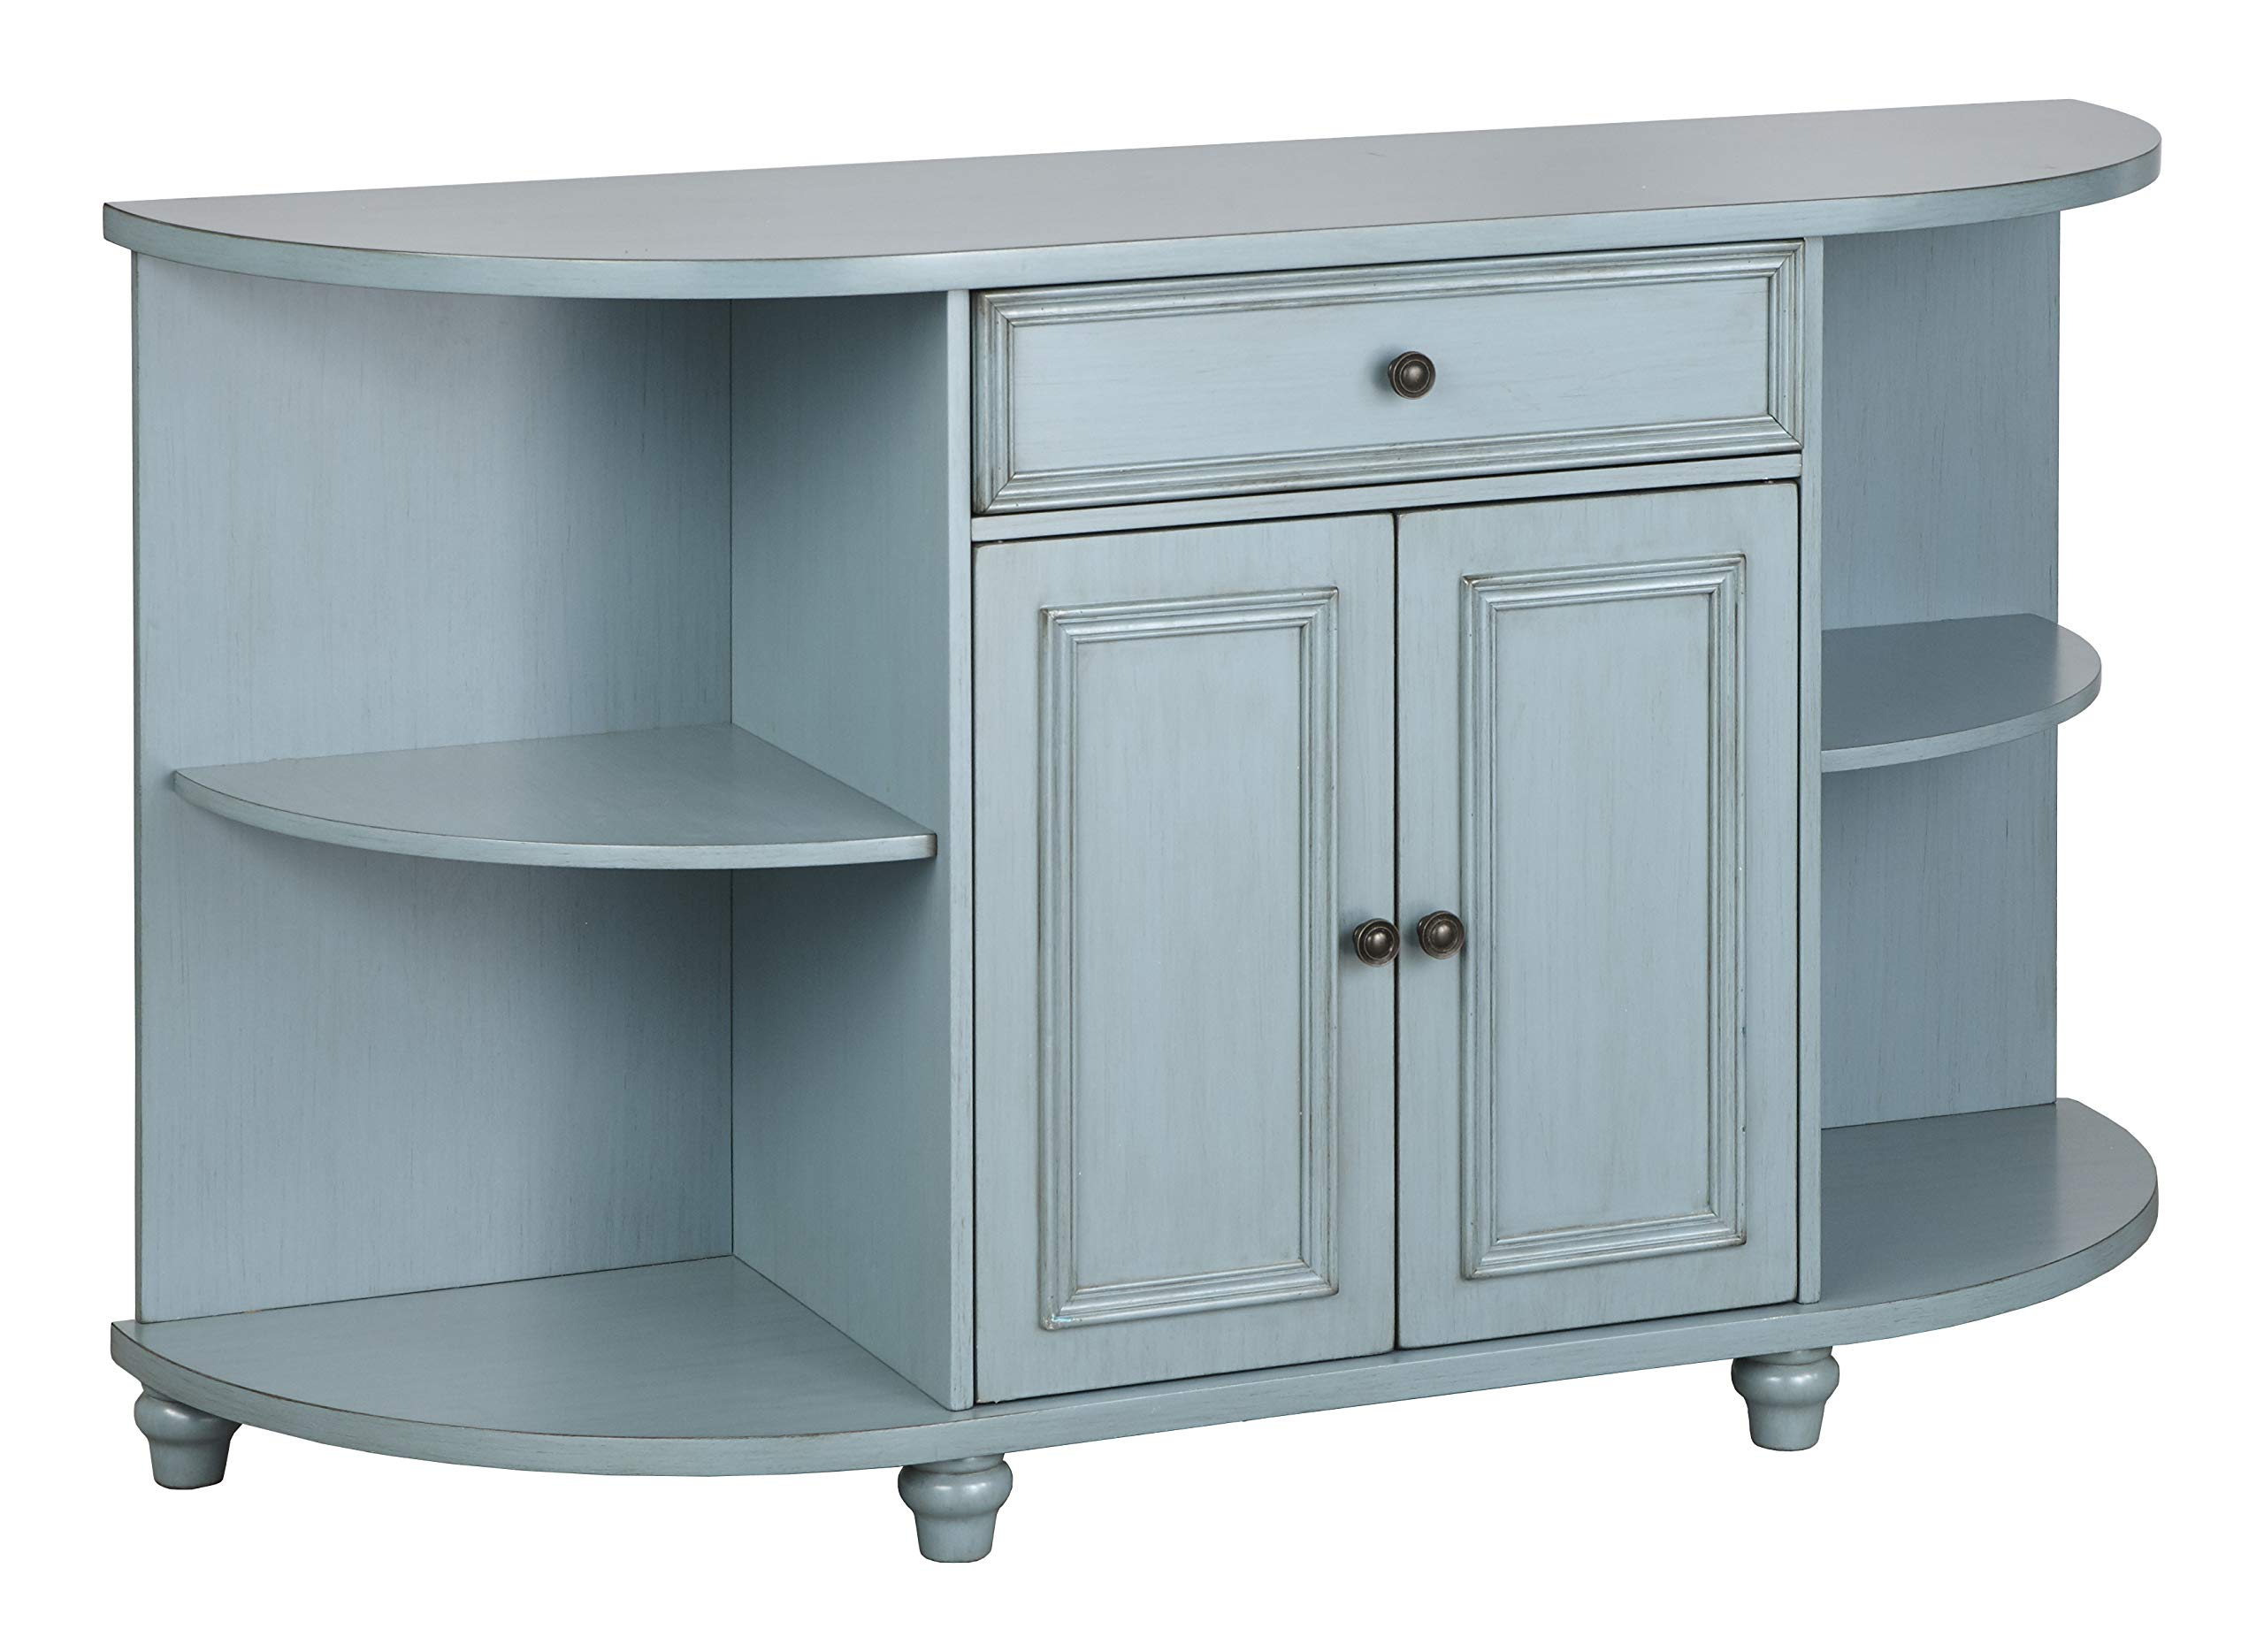 The Mezzanine Shoppe 51000BLU Grace Mid Century Modern 2 Door Dining Room Buffet, 60'', Blue